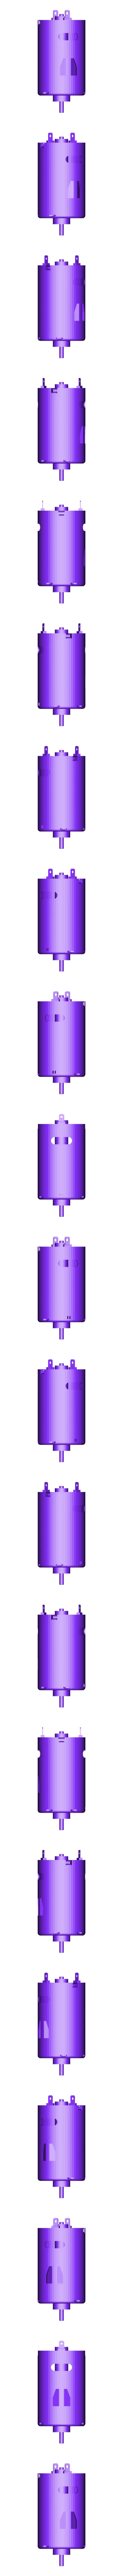 550.STL Download free STL file 540 and 550 motors. • 3D printing template, tahustvedt